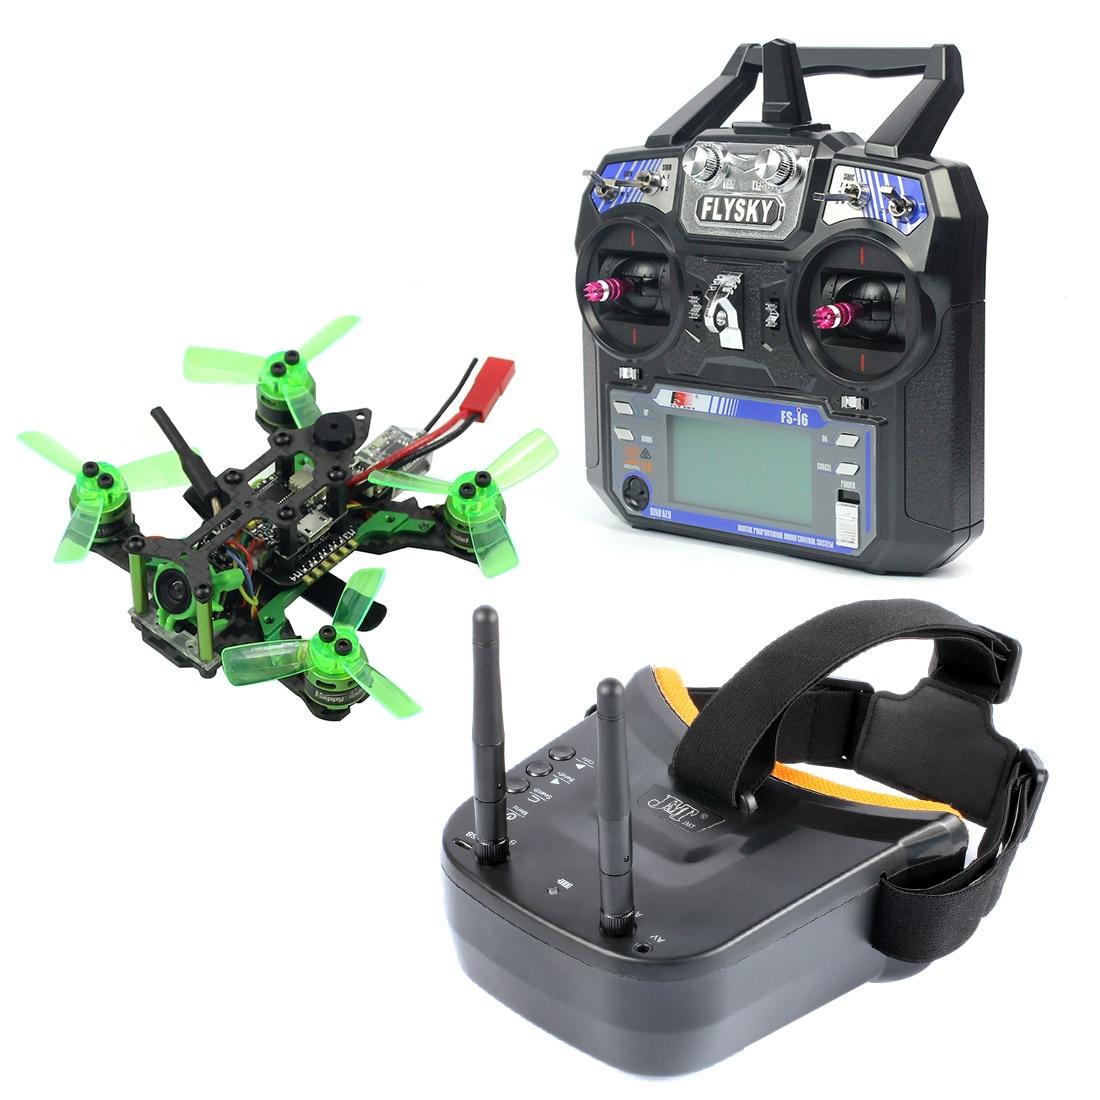 Mantis85 85 мм 6CH 2,4 г RC FPV Micro Racer Drone Quadcopter RTF 600TVL Камера VTX и двойной антенны 5,8 г 40ch мини видео очки